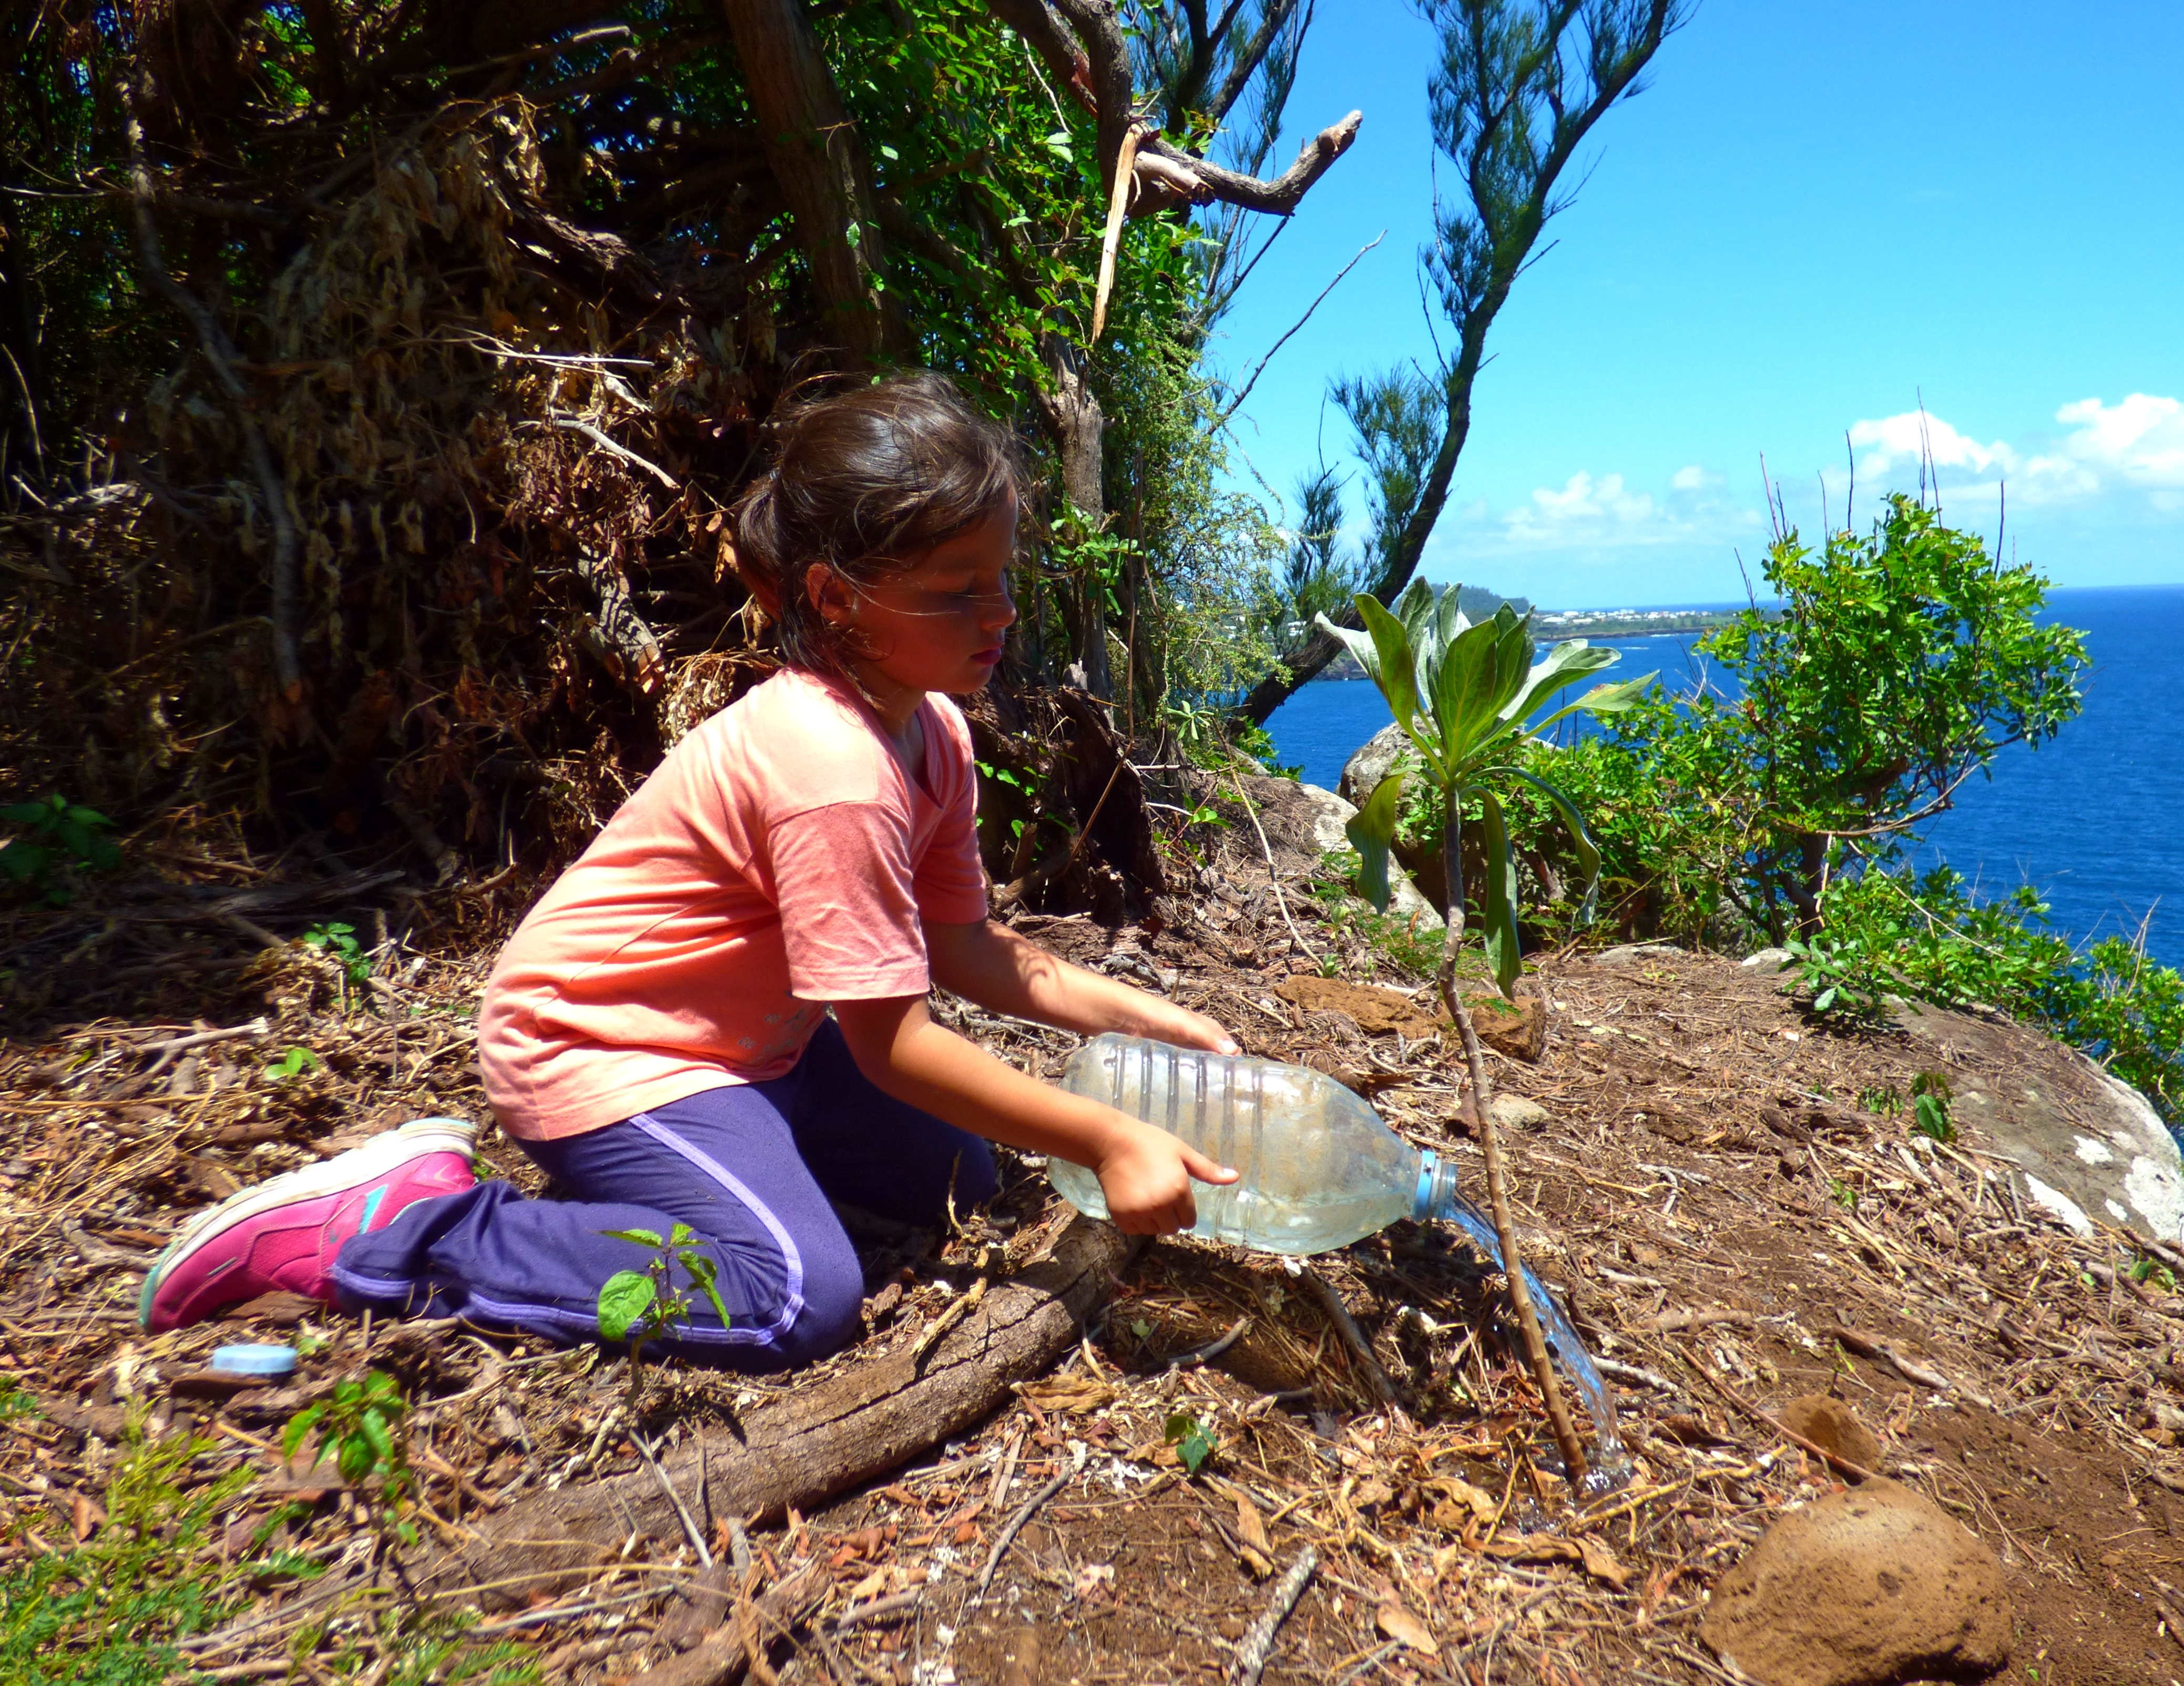 Copie de Entretien des plantes indigenes par une benevole de la SEOR